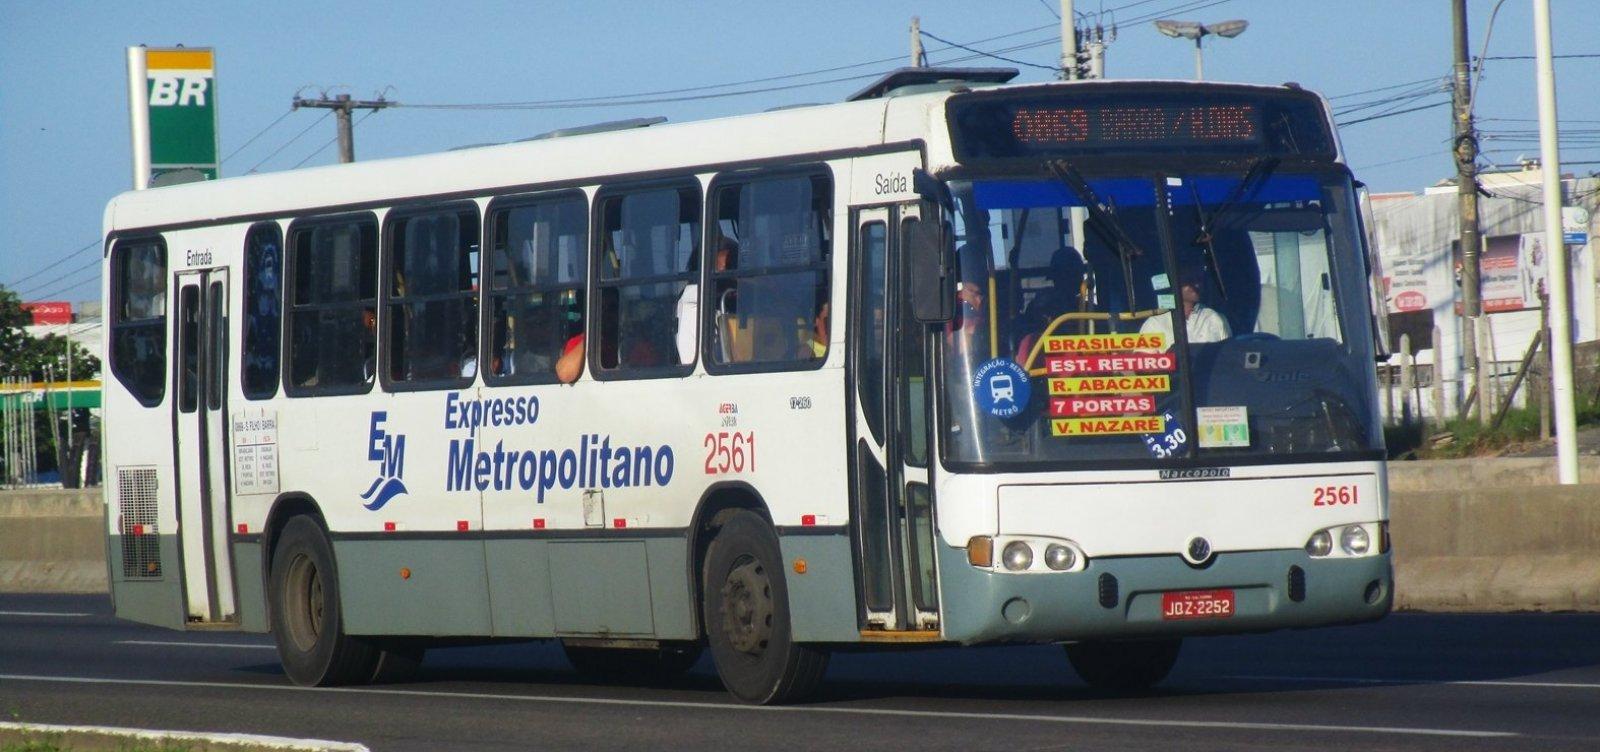 [Justiça condena empresa de ônibus de Simões Filho a indenizar motorista vítima de assalto]